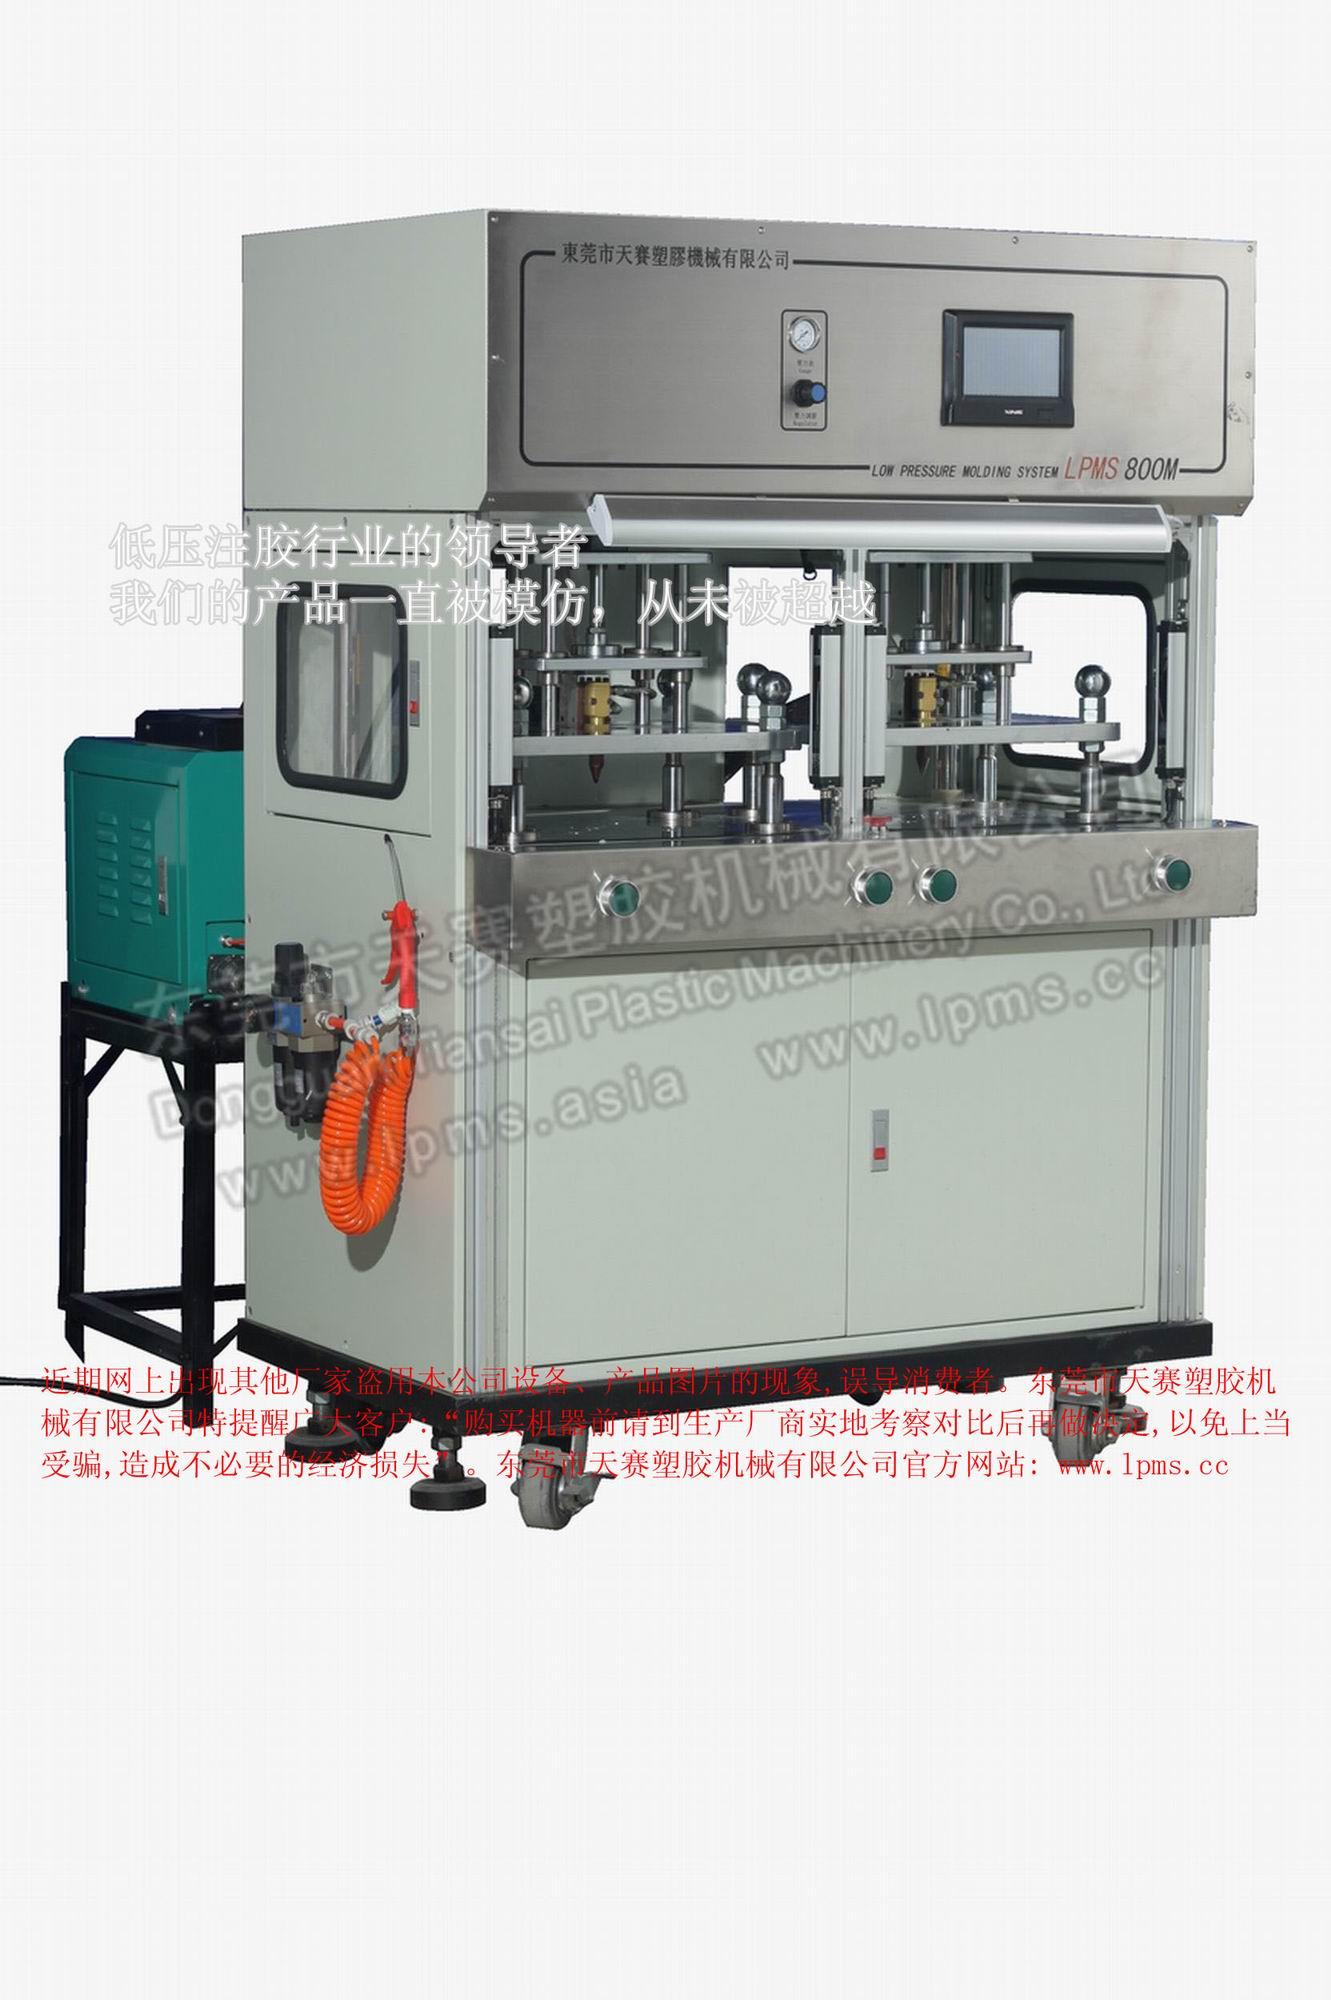 LPMS 800M 顶式双工位分体型